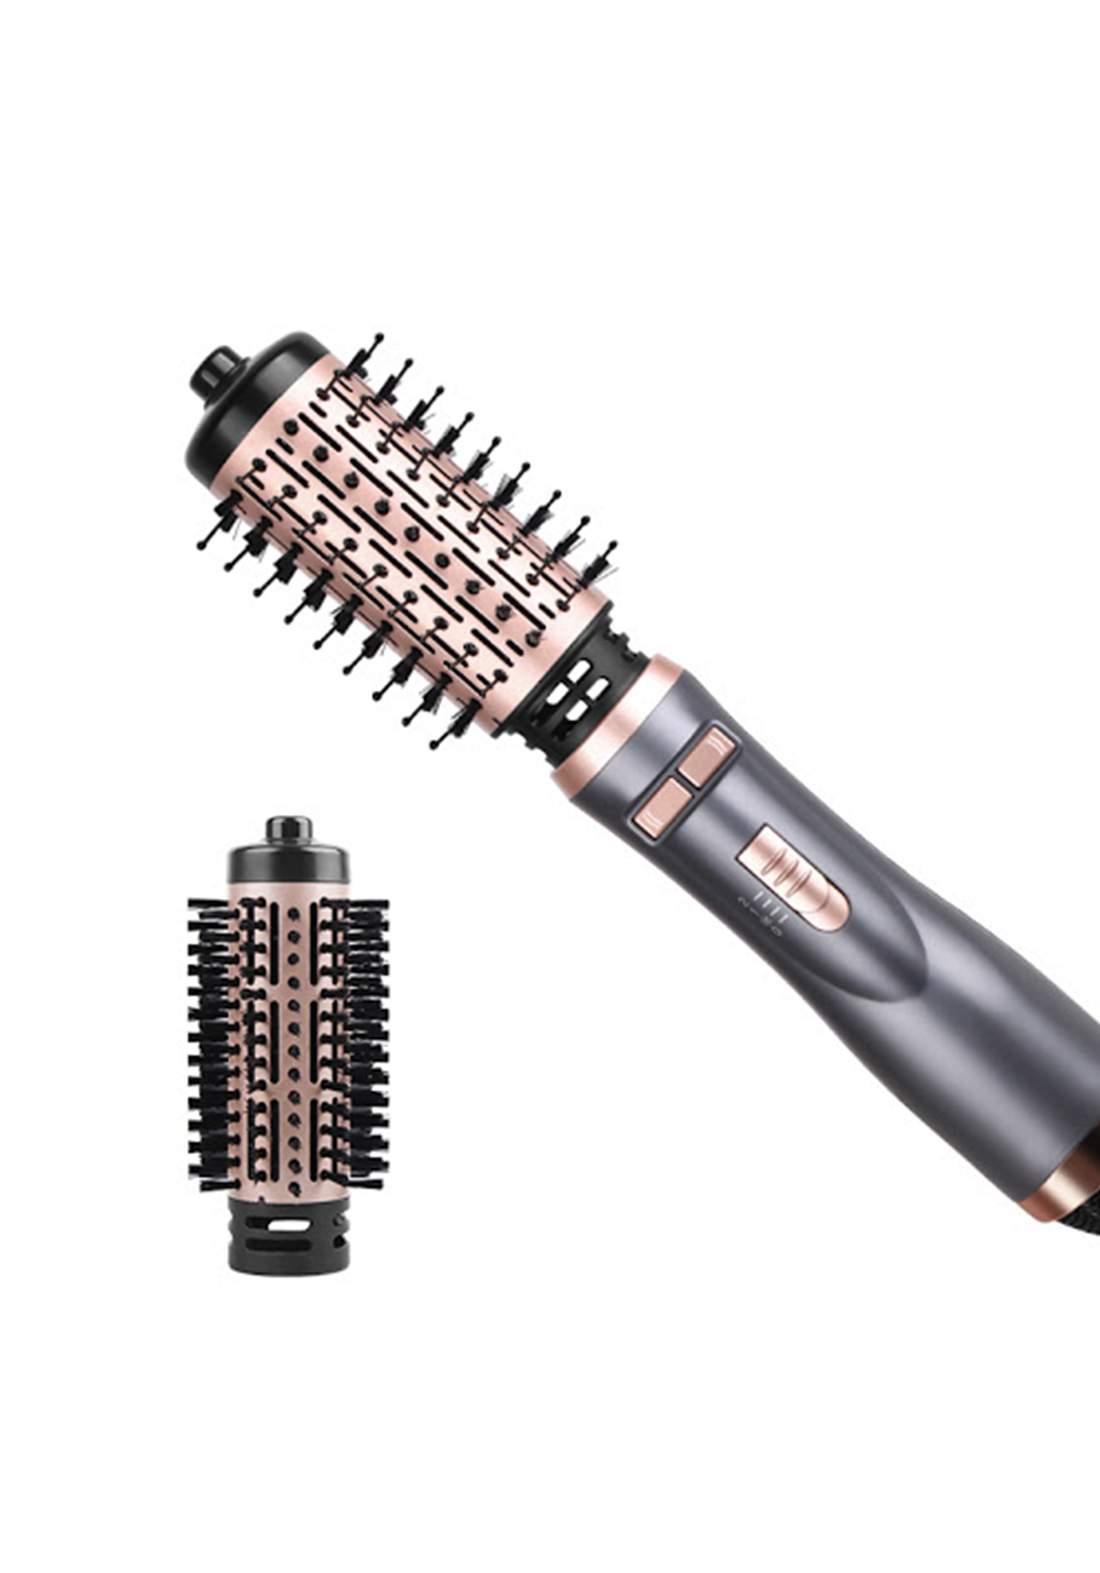 Enzo en-742 Professional Hair Dryer Brush فرشاة حرارية